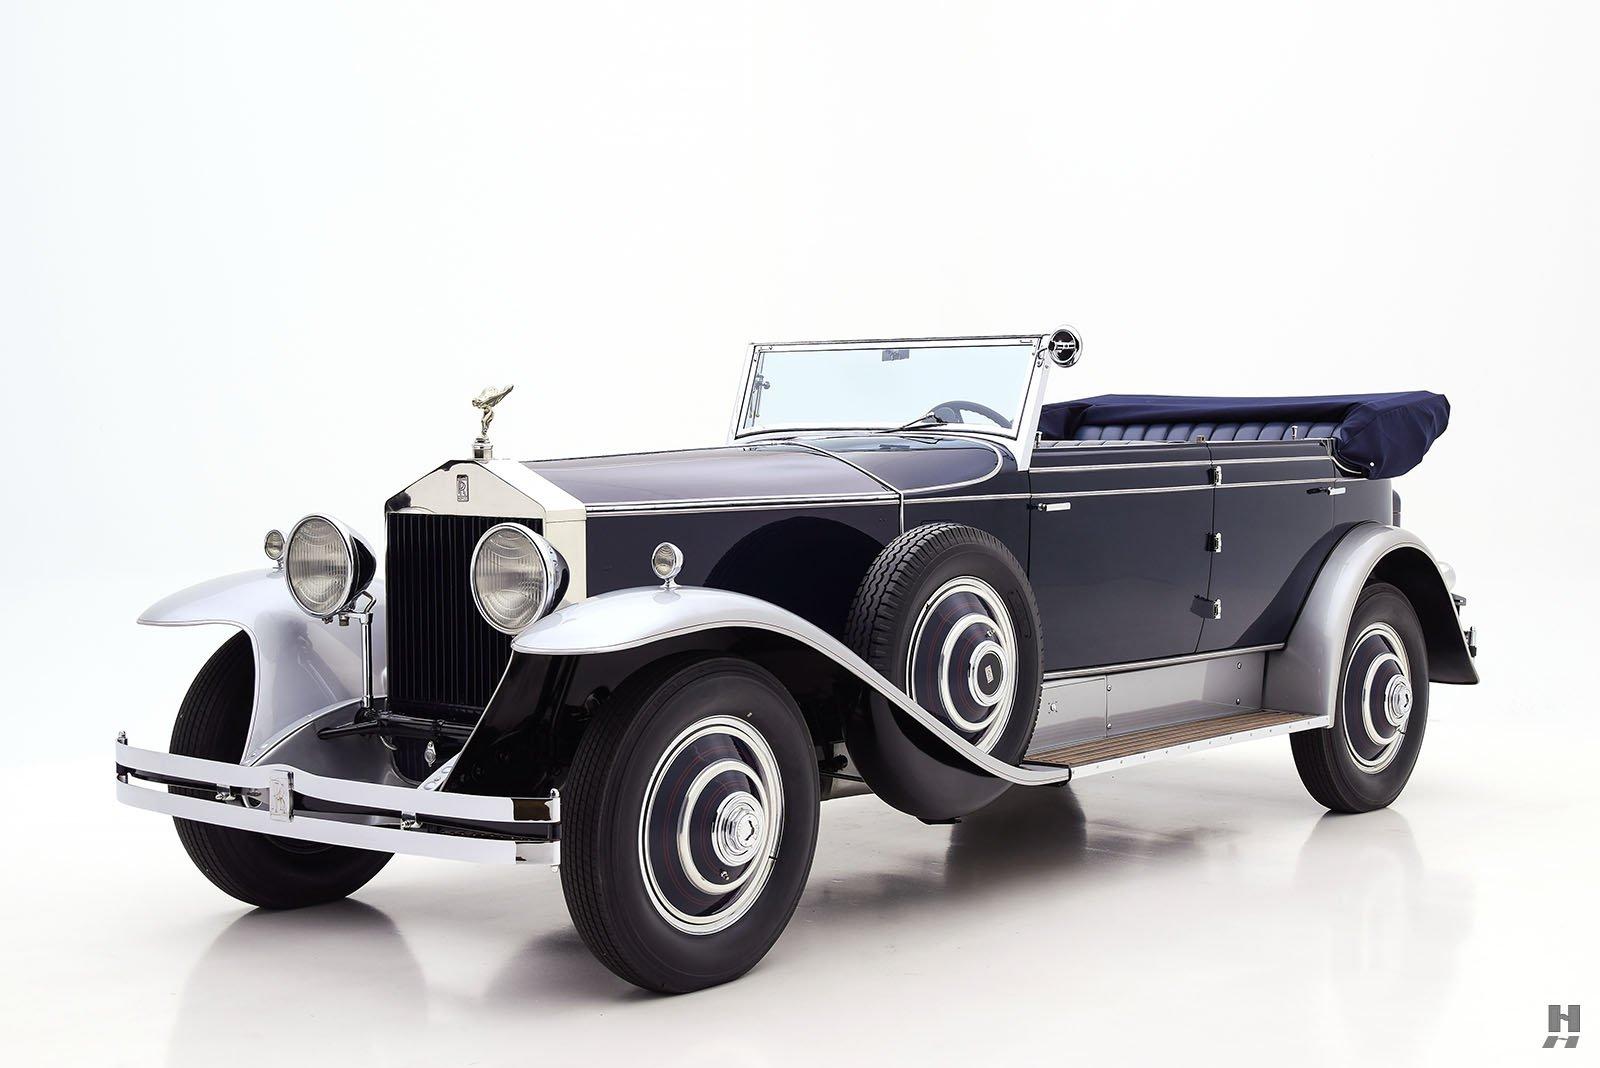 1930 Rolls-Royce Phantom I Newmarket Phaeton | Hyman Ltd. Classic Cars